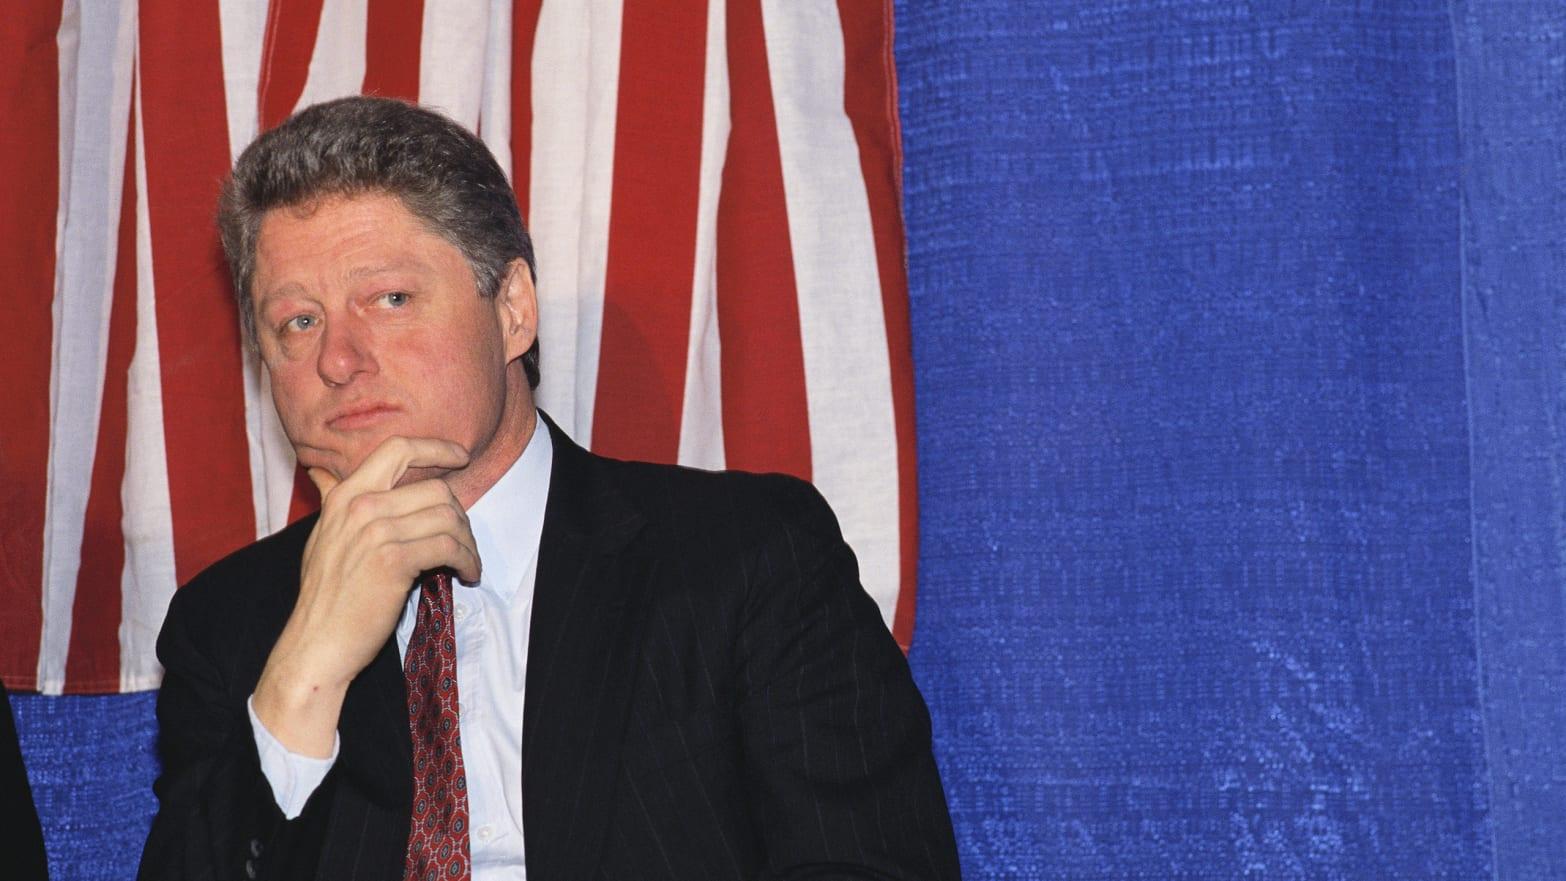 Bill Clinton. Photo: The Daily Beast.